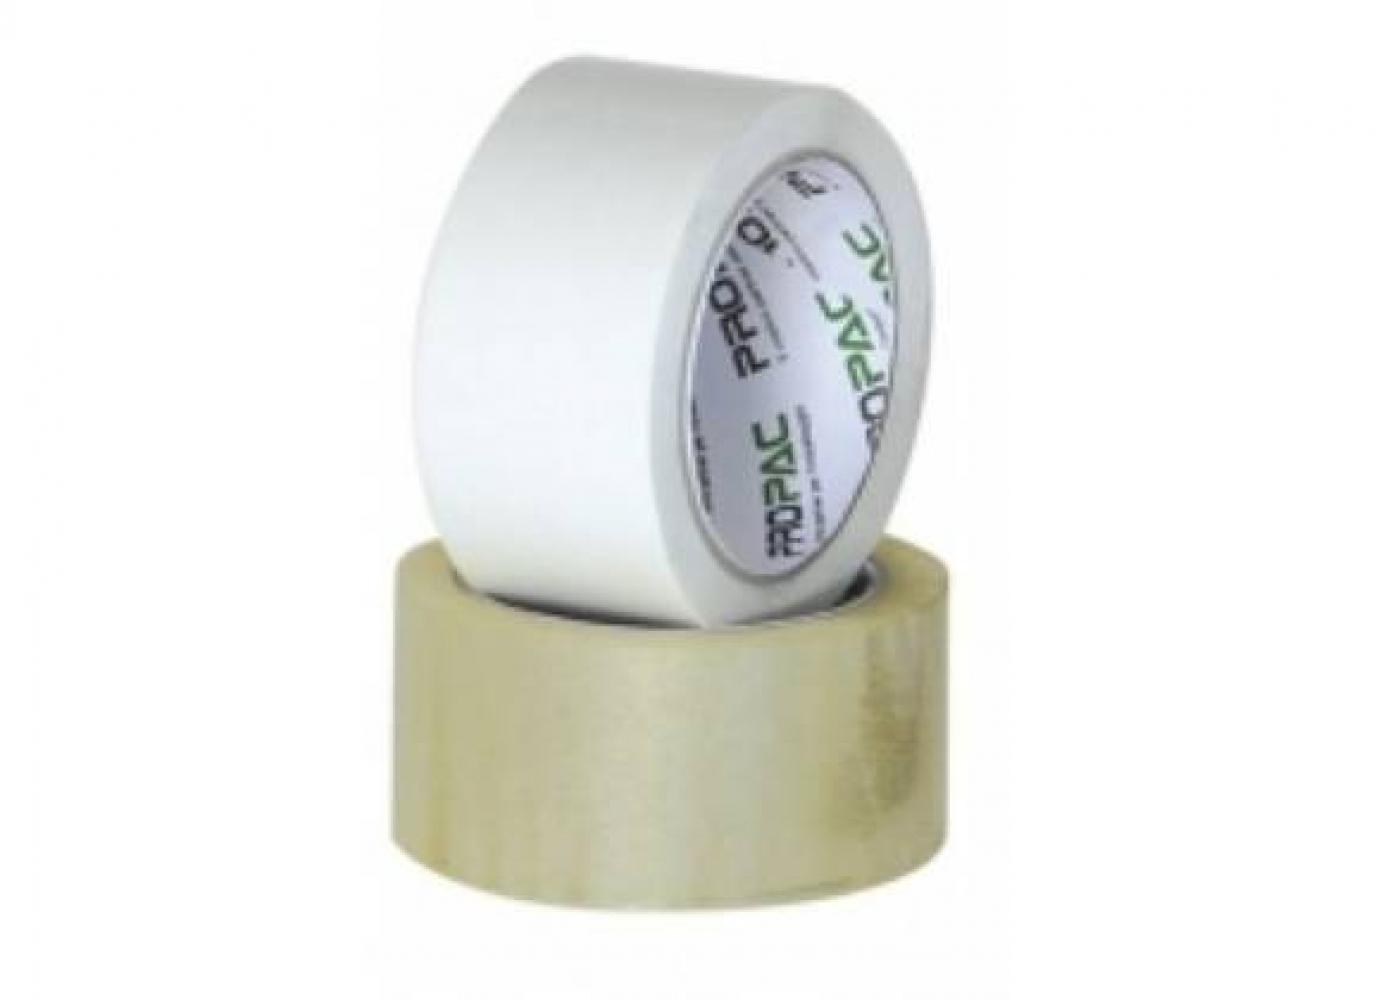 Acquista 36 Pezzi Nastro Opp S Trasparente 17545732 | Glooke.com